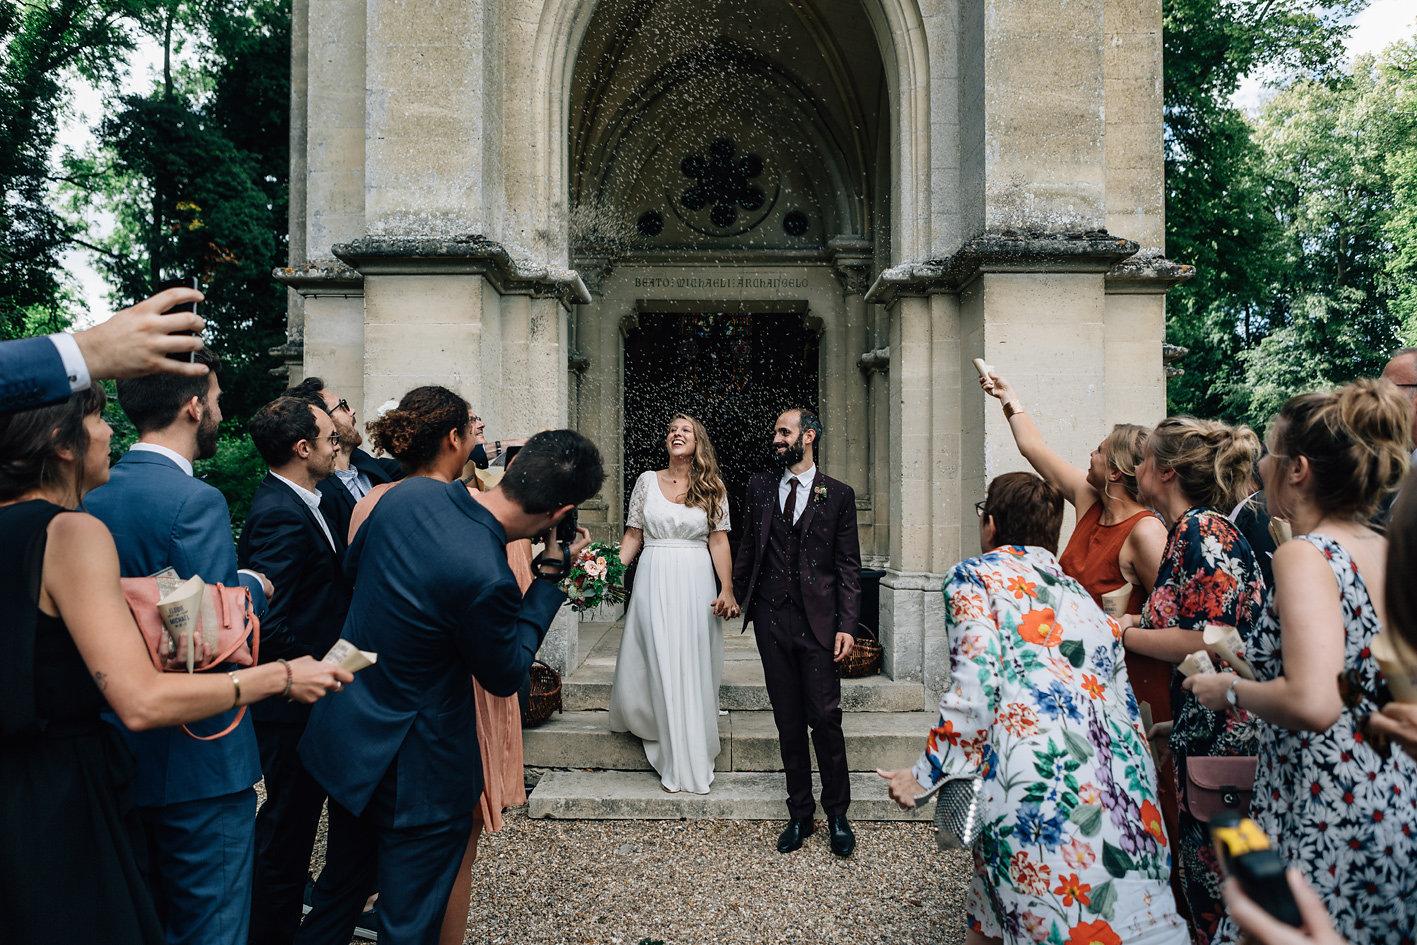 pierreatelier-photographe-mariage-paris-orangeriedevatimesnil-310.jpg